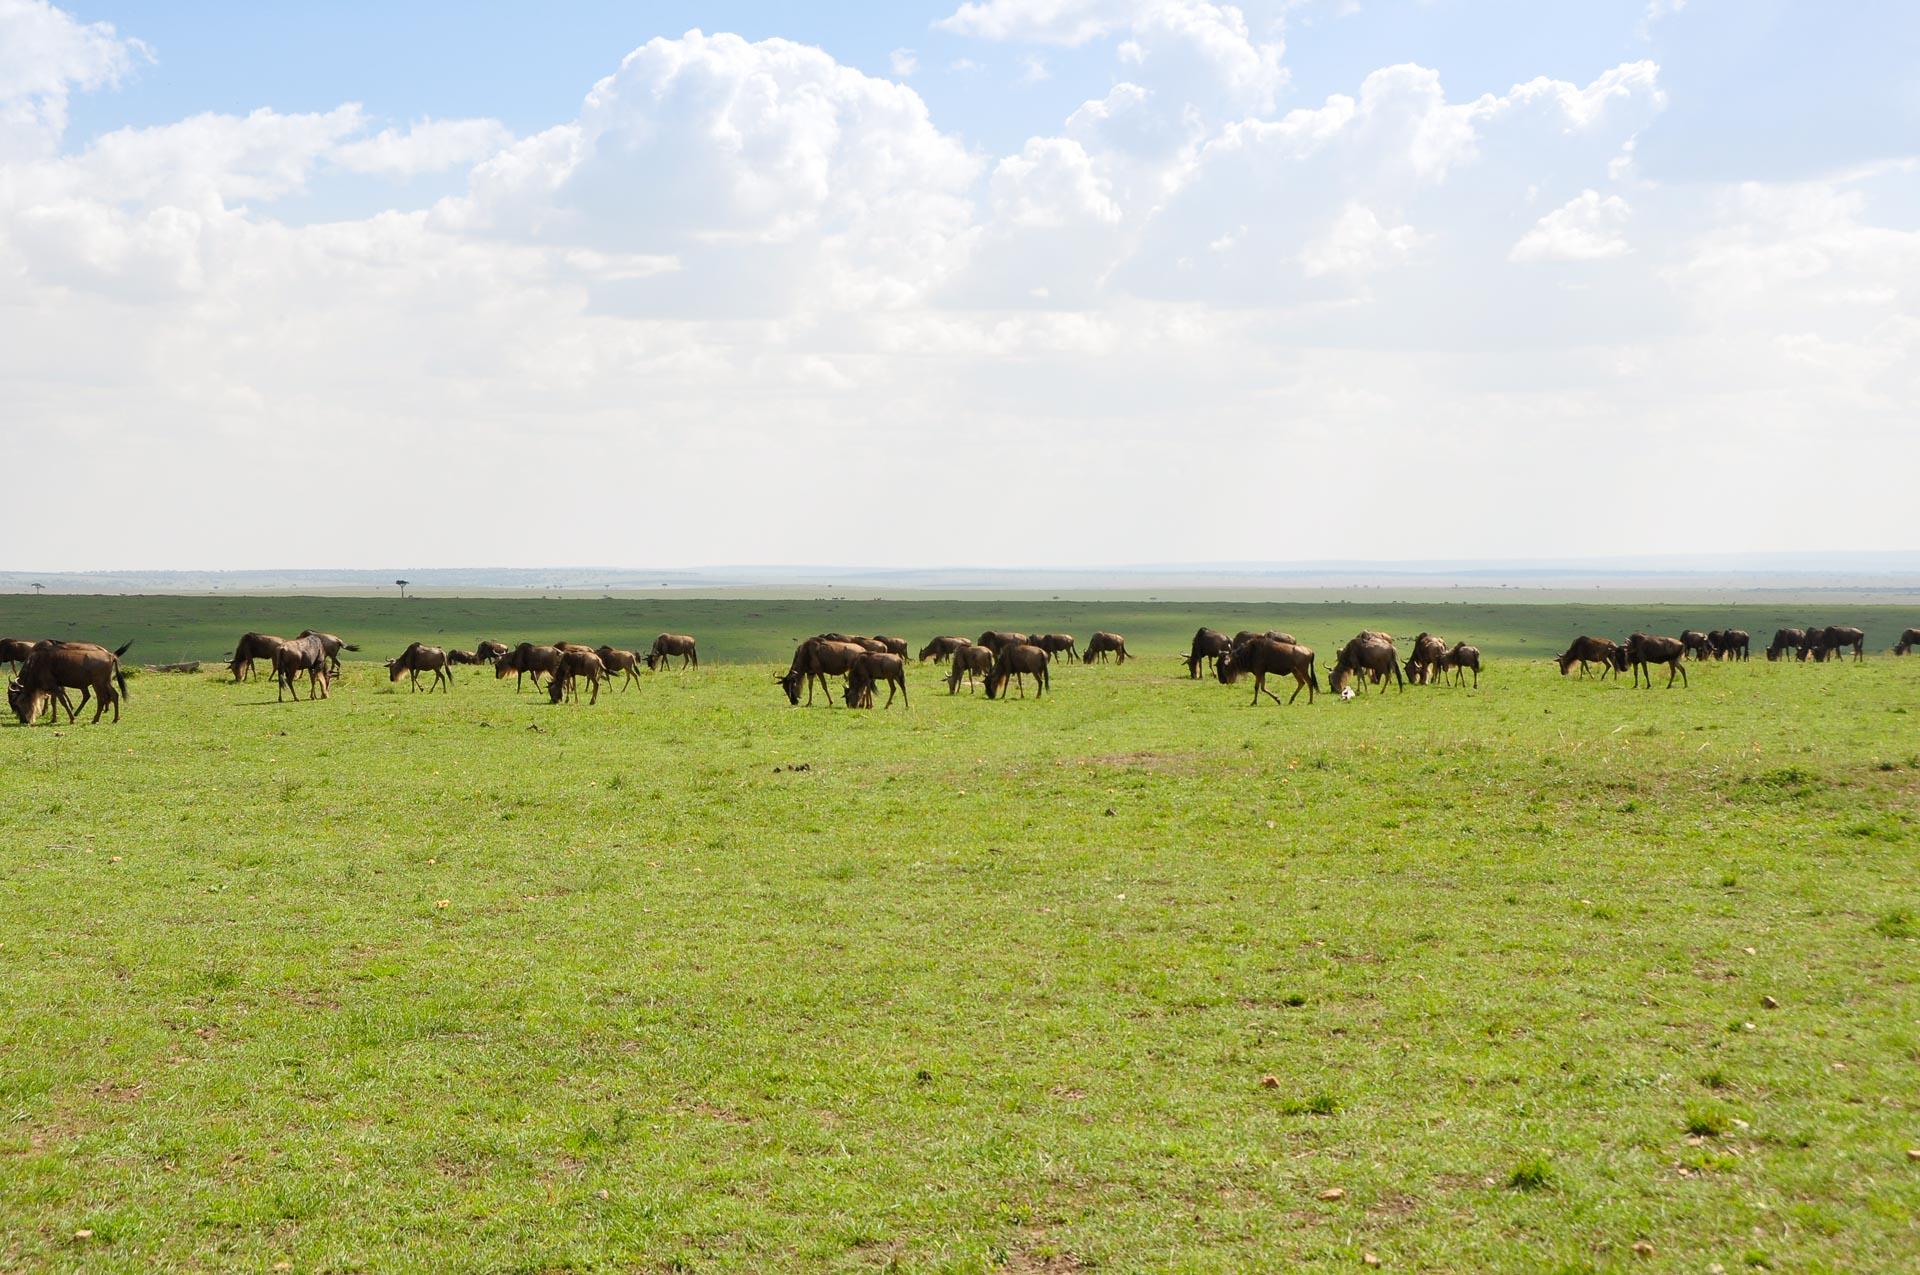 Masai-Mara-Kenia-Globetrotter-Select-17